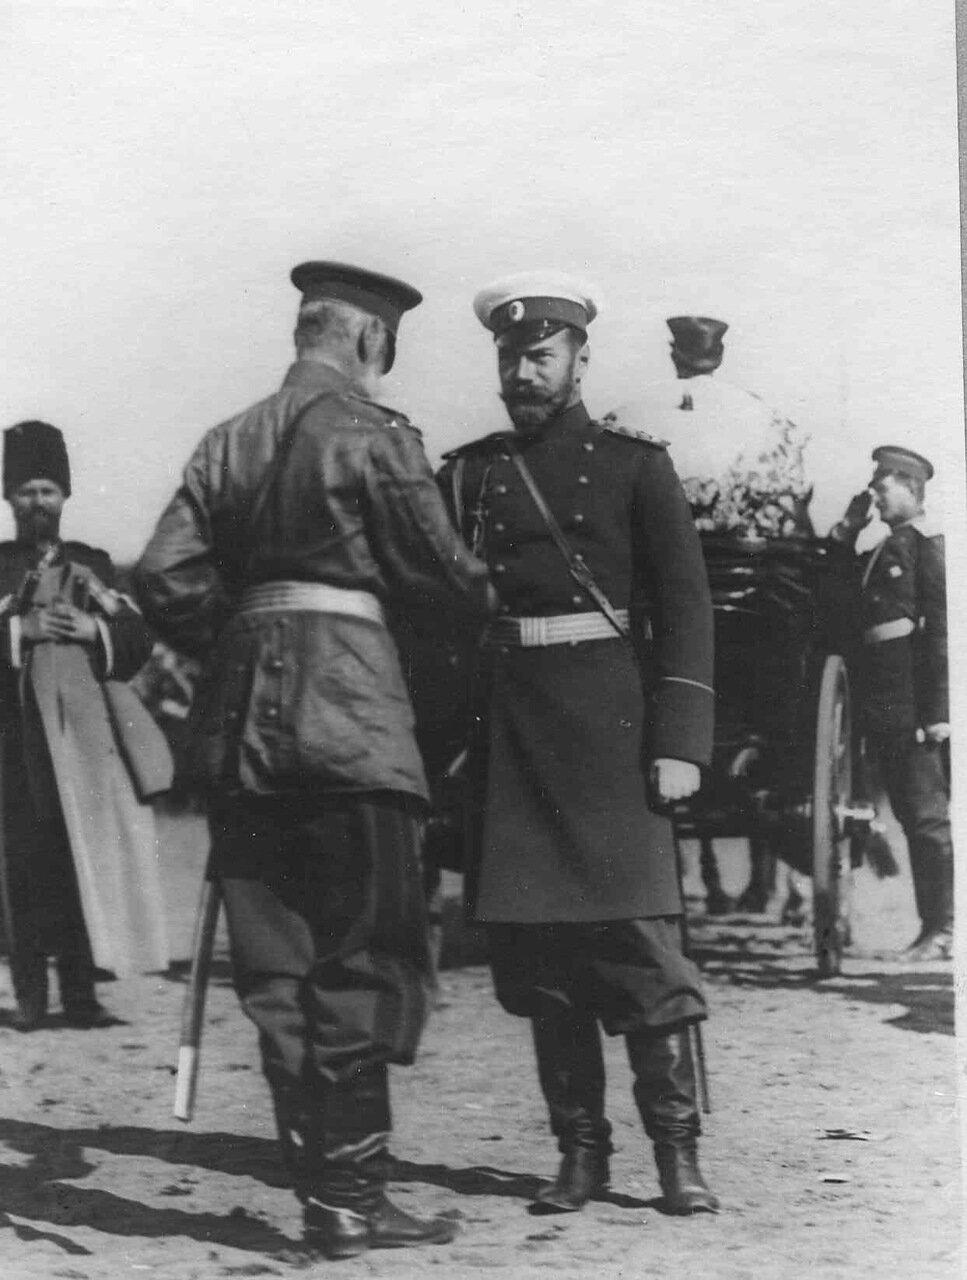 32. Император Николай II во время беседы с генерал-адъютантом бароном Ф.Е.Мейендорфом - командиром 1-го армейского корпуса